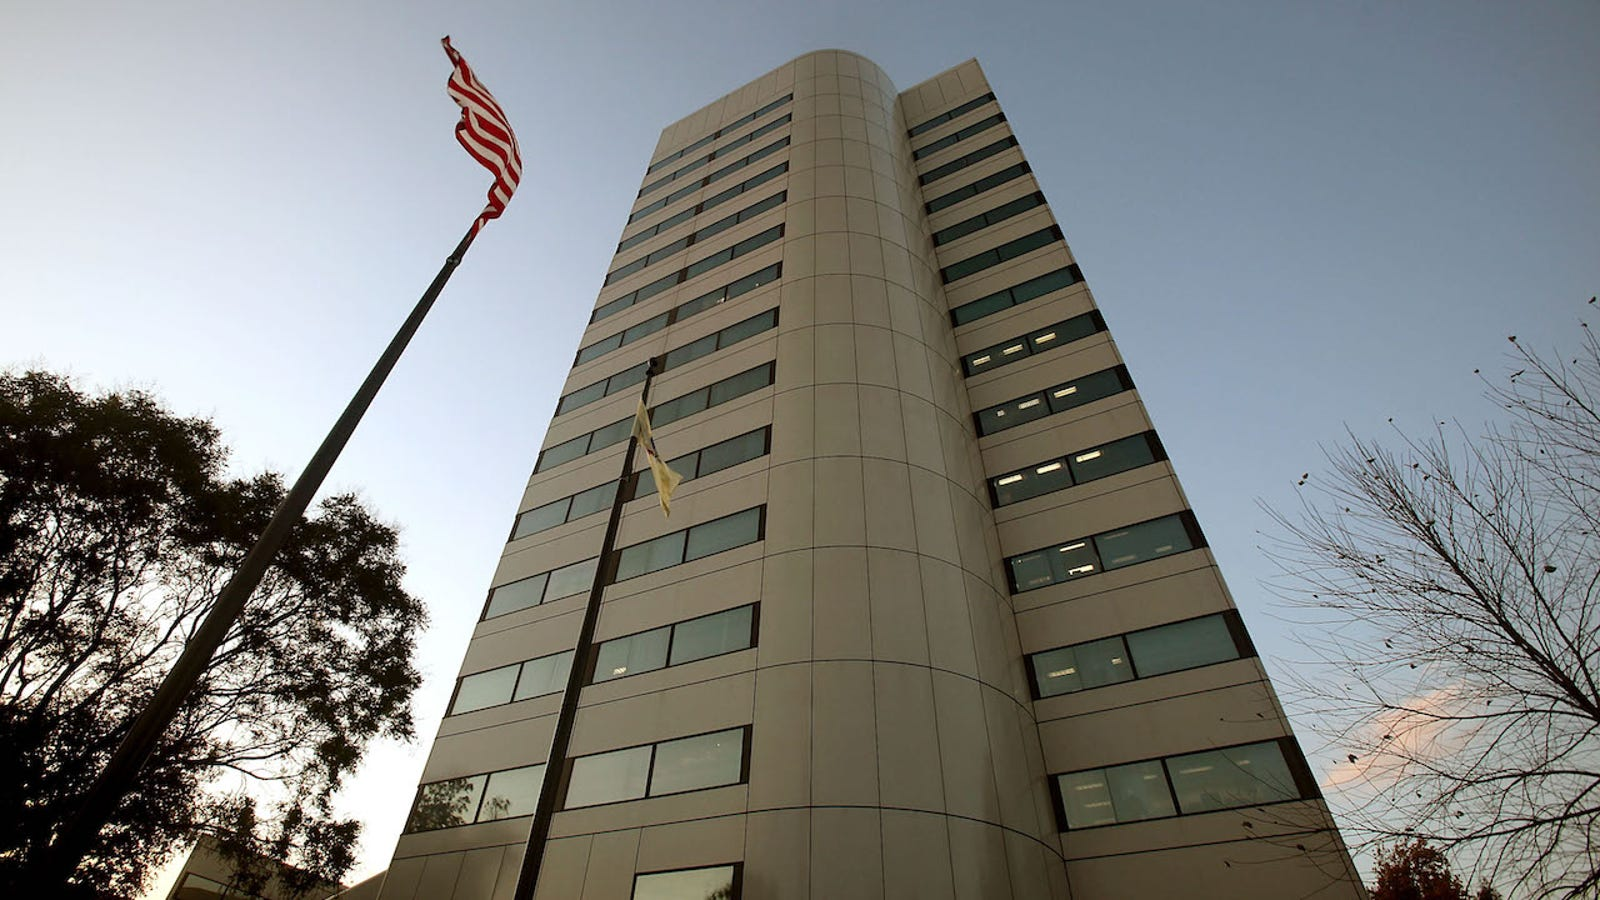 Johnson & Johnson Ordered to Pay $8 Billion in Risperdal Case Involving Male Breast Growth